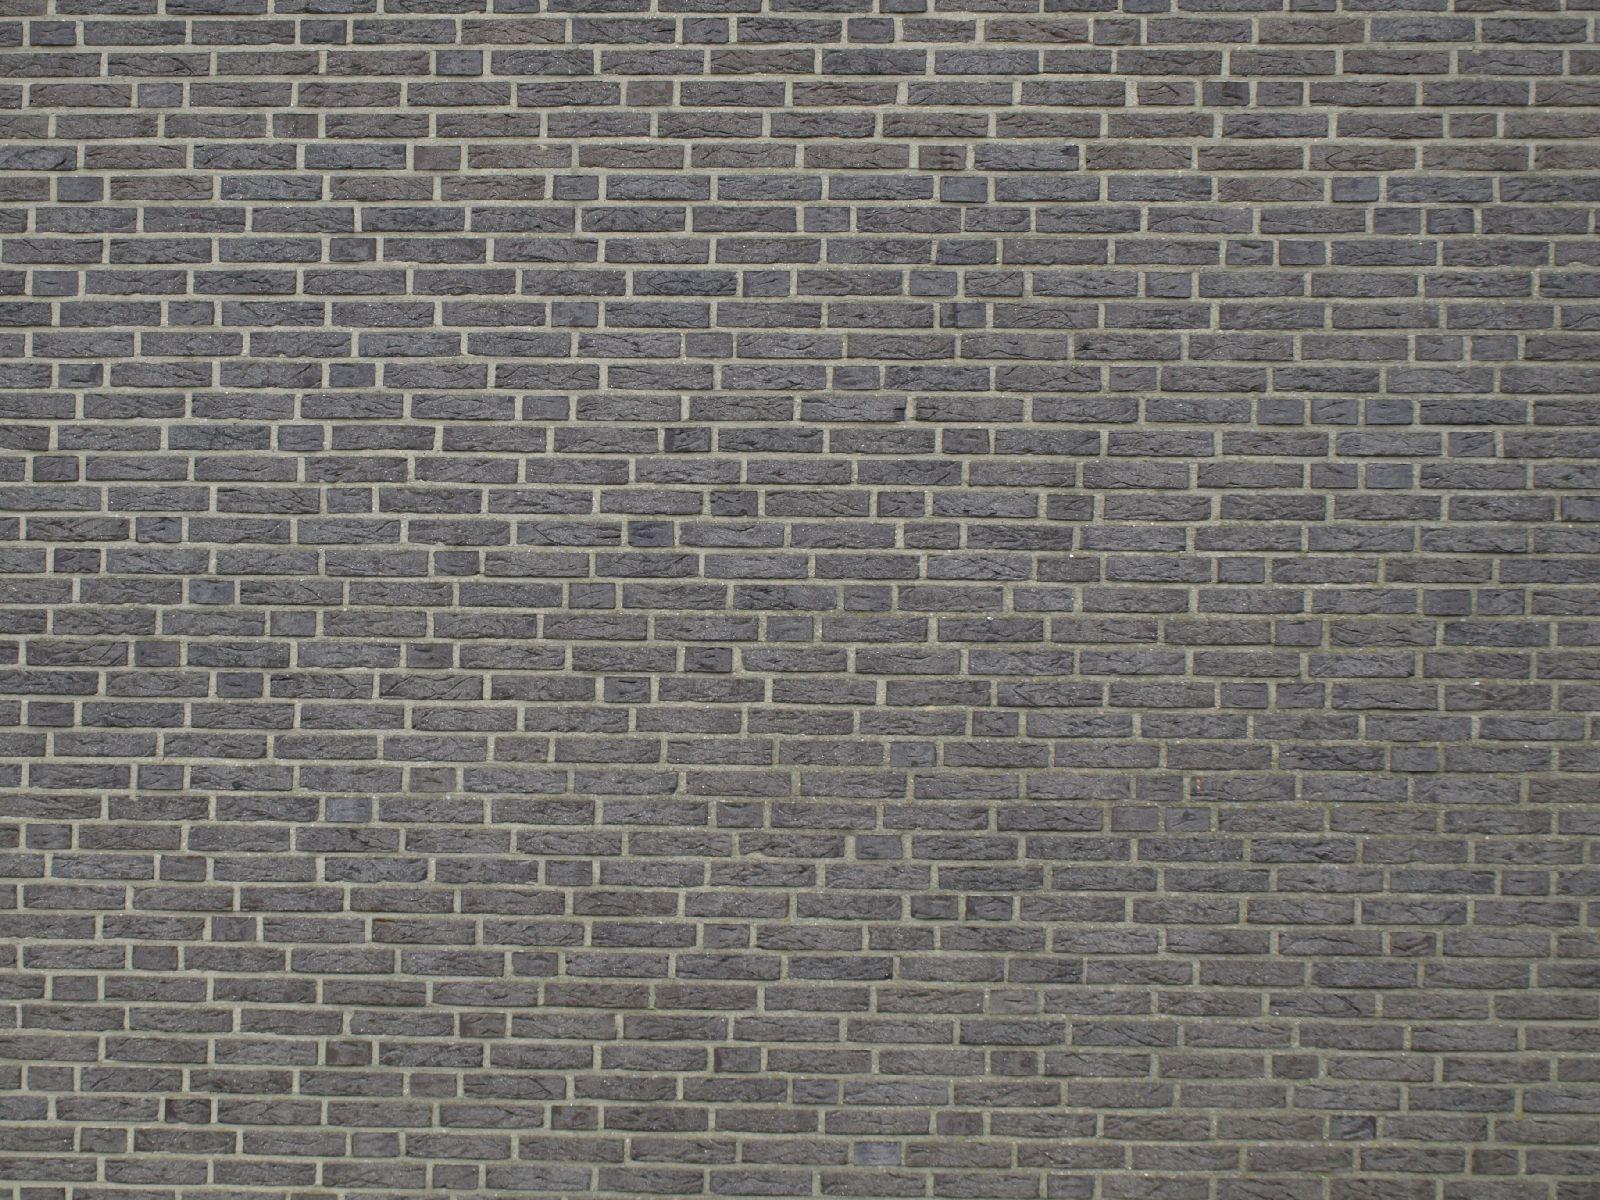 Wand-Mauerwerk-Backstein_Textur_A_P6283837